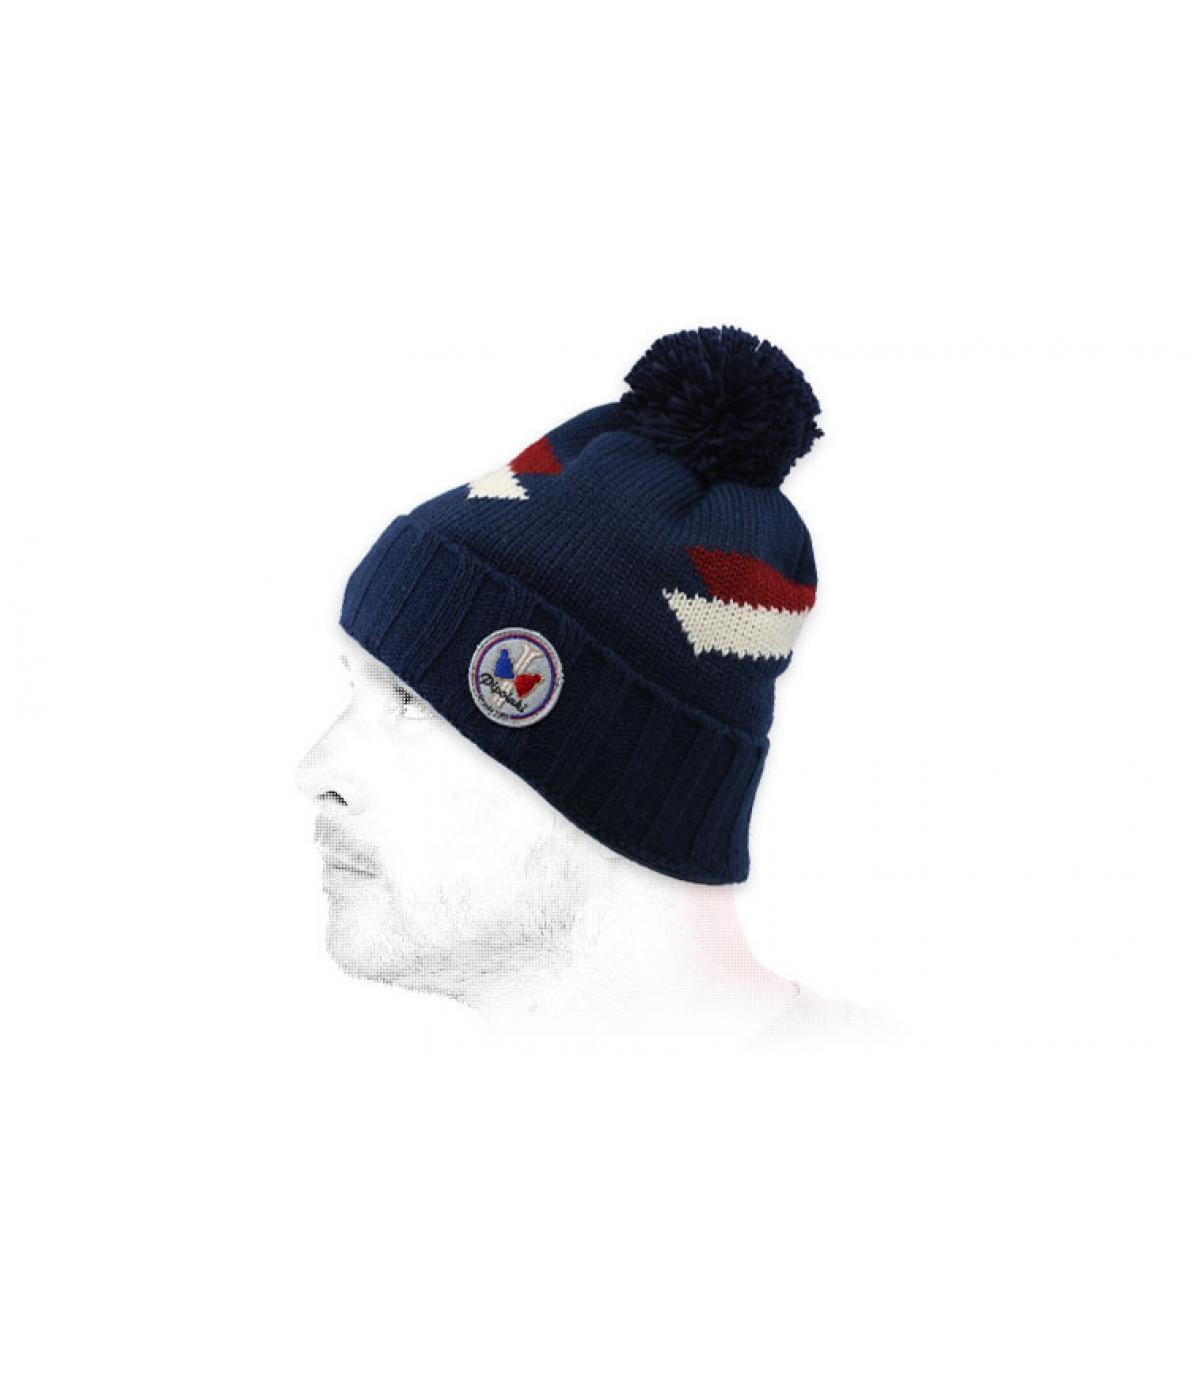 Bommel Mütze marineblau